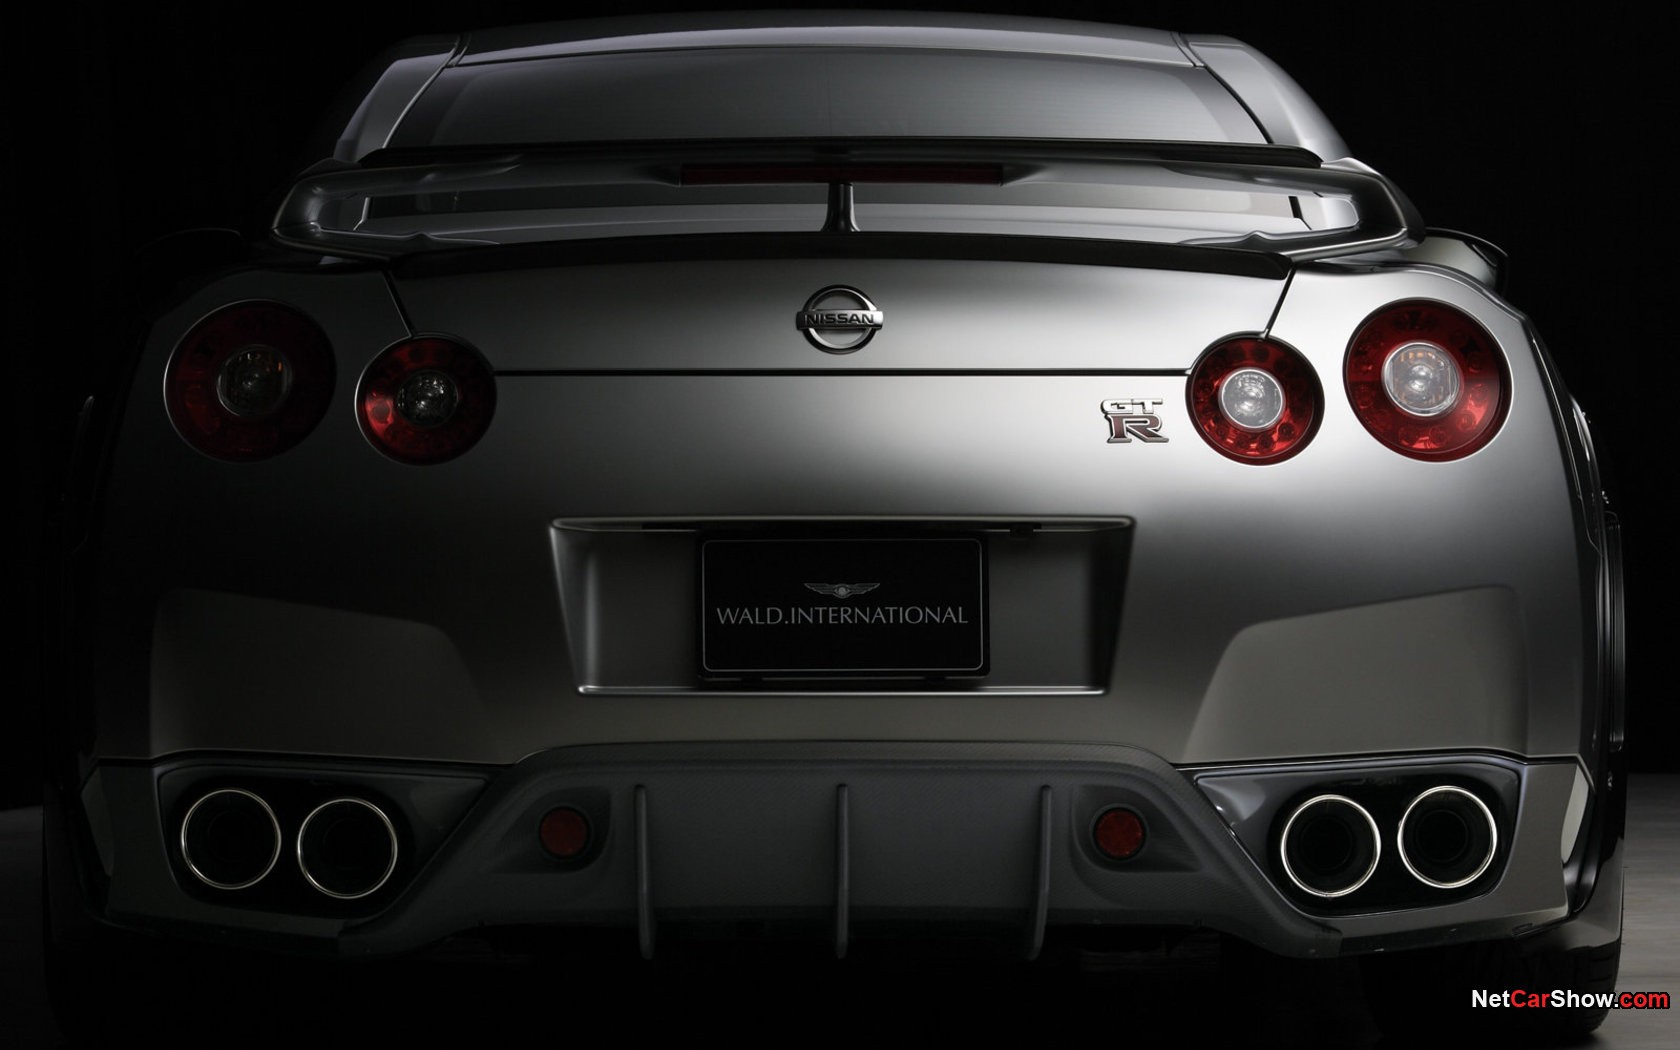 Cars Nissan Wallpaper 1680x1050 Cars Nissan GTR R35 1680x1050